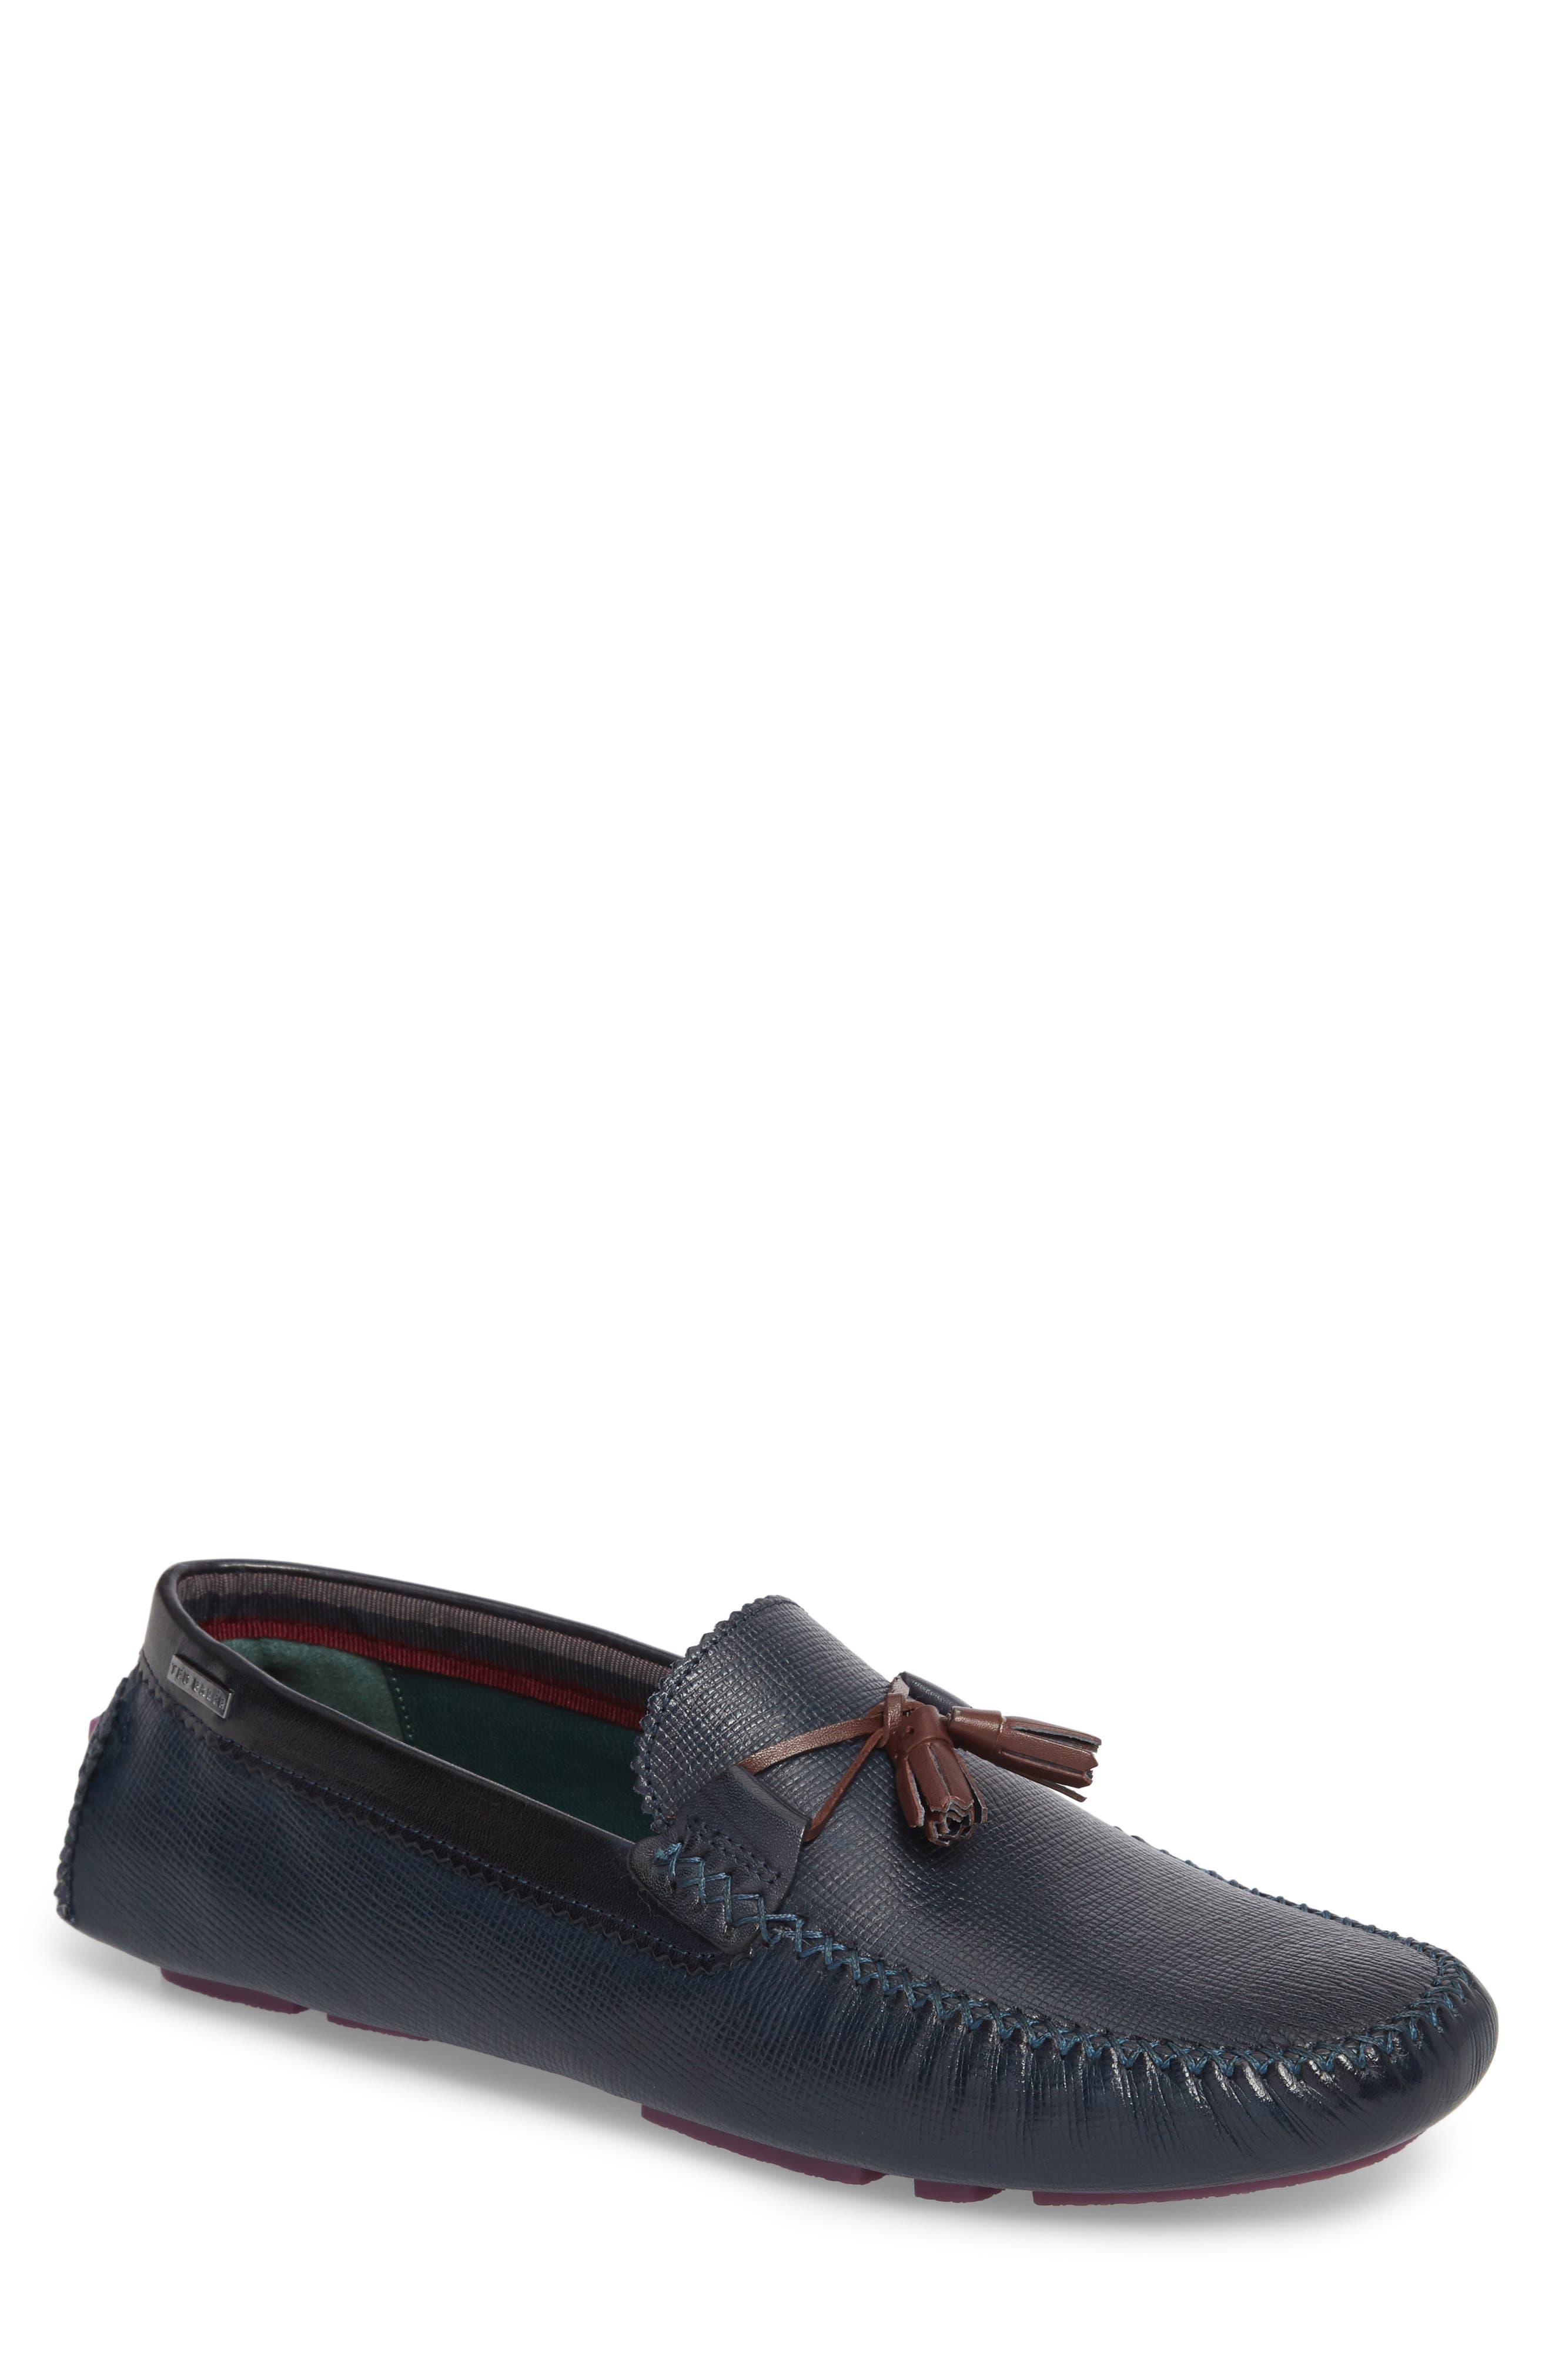 Urbonn Tasseled Driving Loafer,                             Main thumbnail 1, color,                             Dark Blue Leather